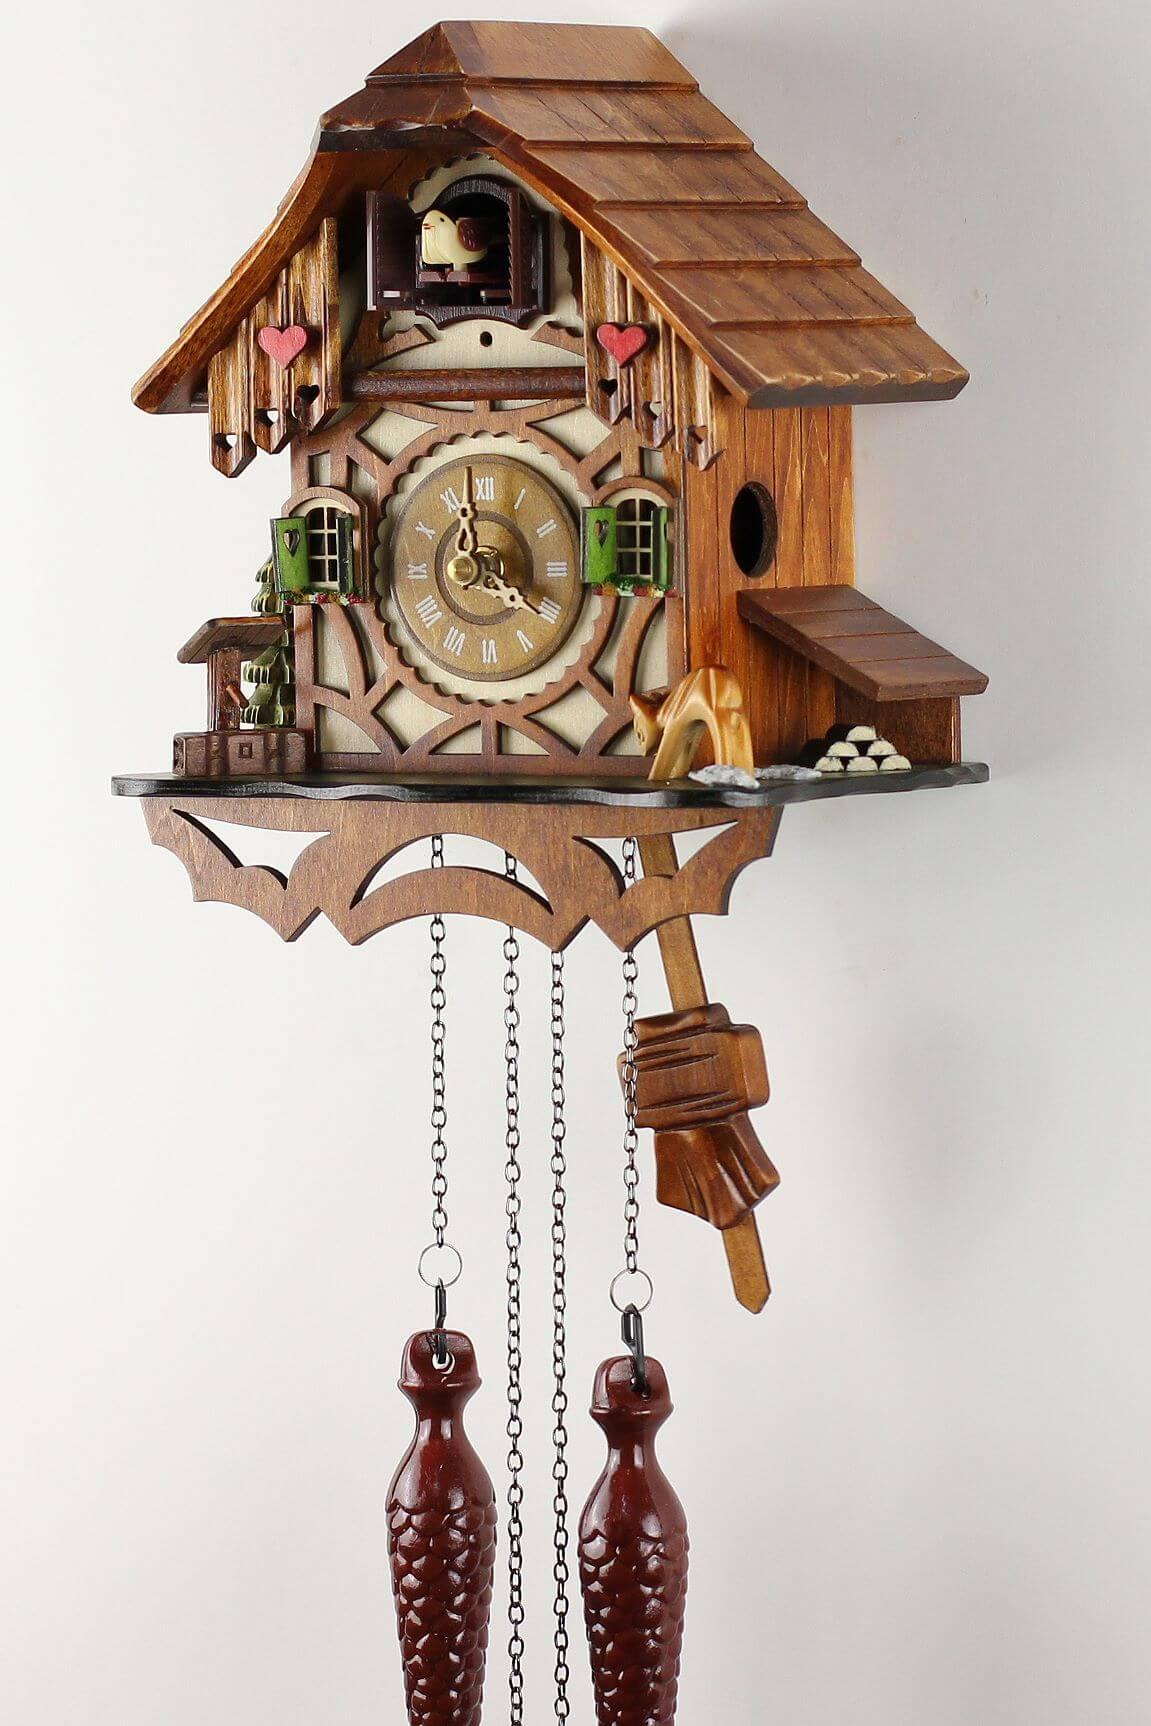 Eble fachwerkhaus 24cm coucou pendule bois v ritable for Fachwerkhaus definition